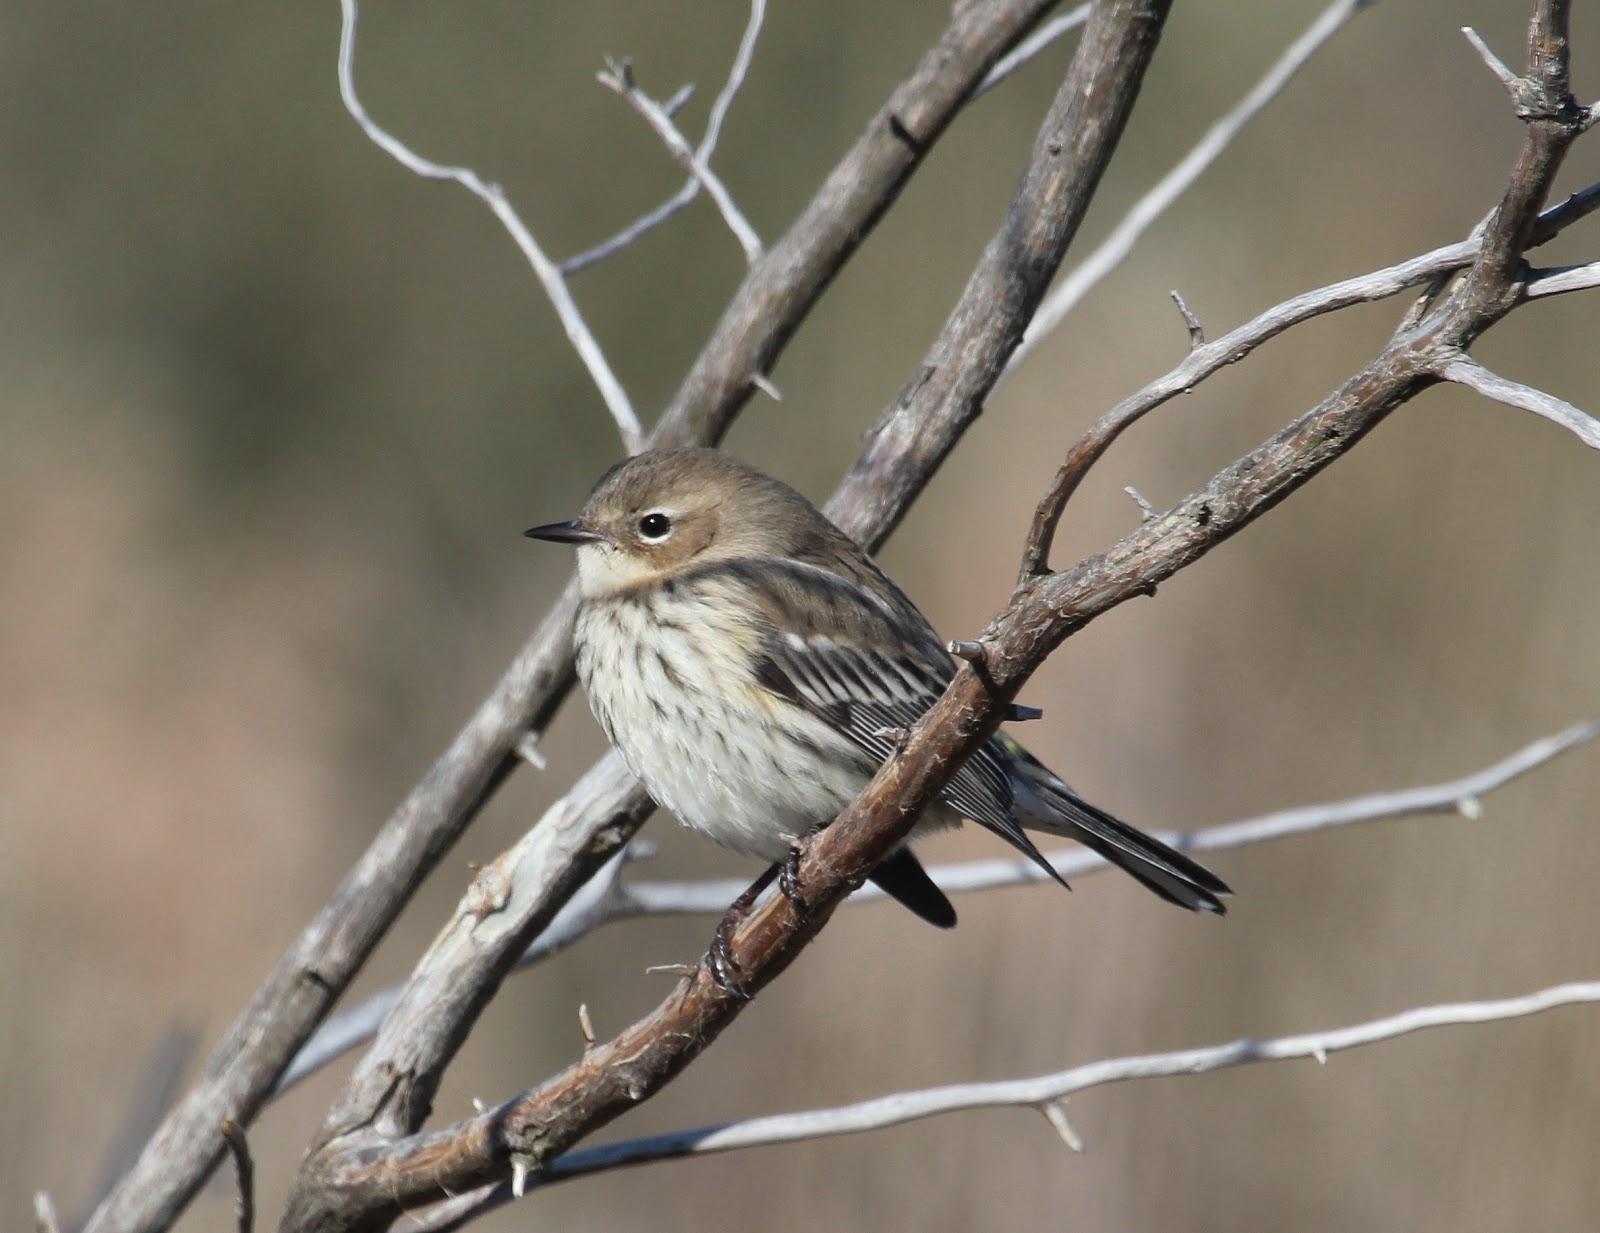 Yellow rumped warbler winter plumage